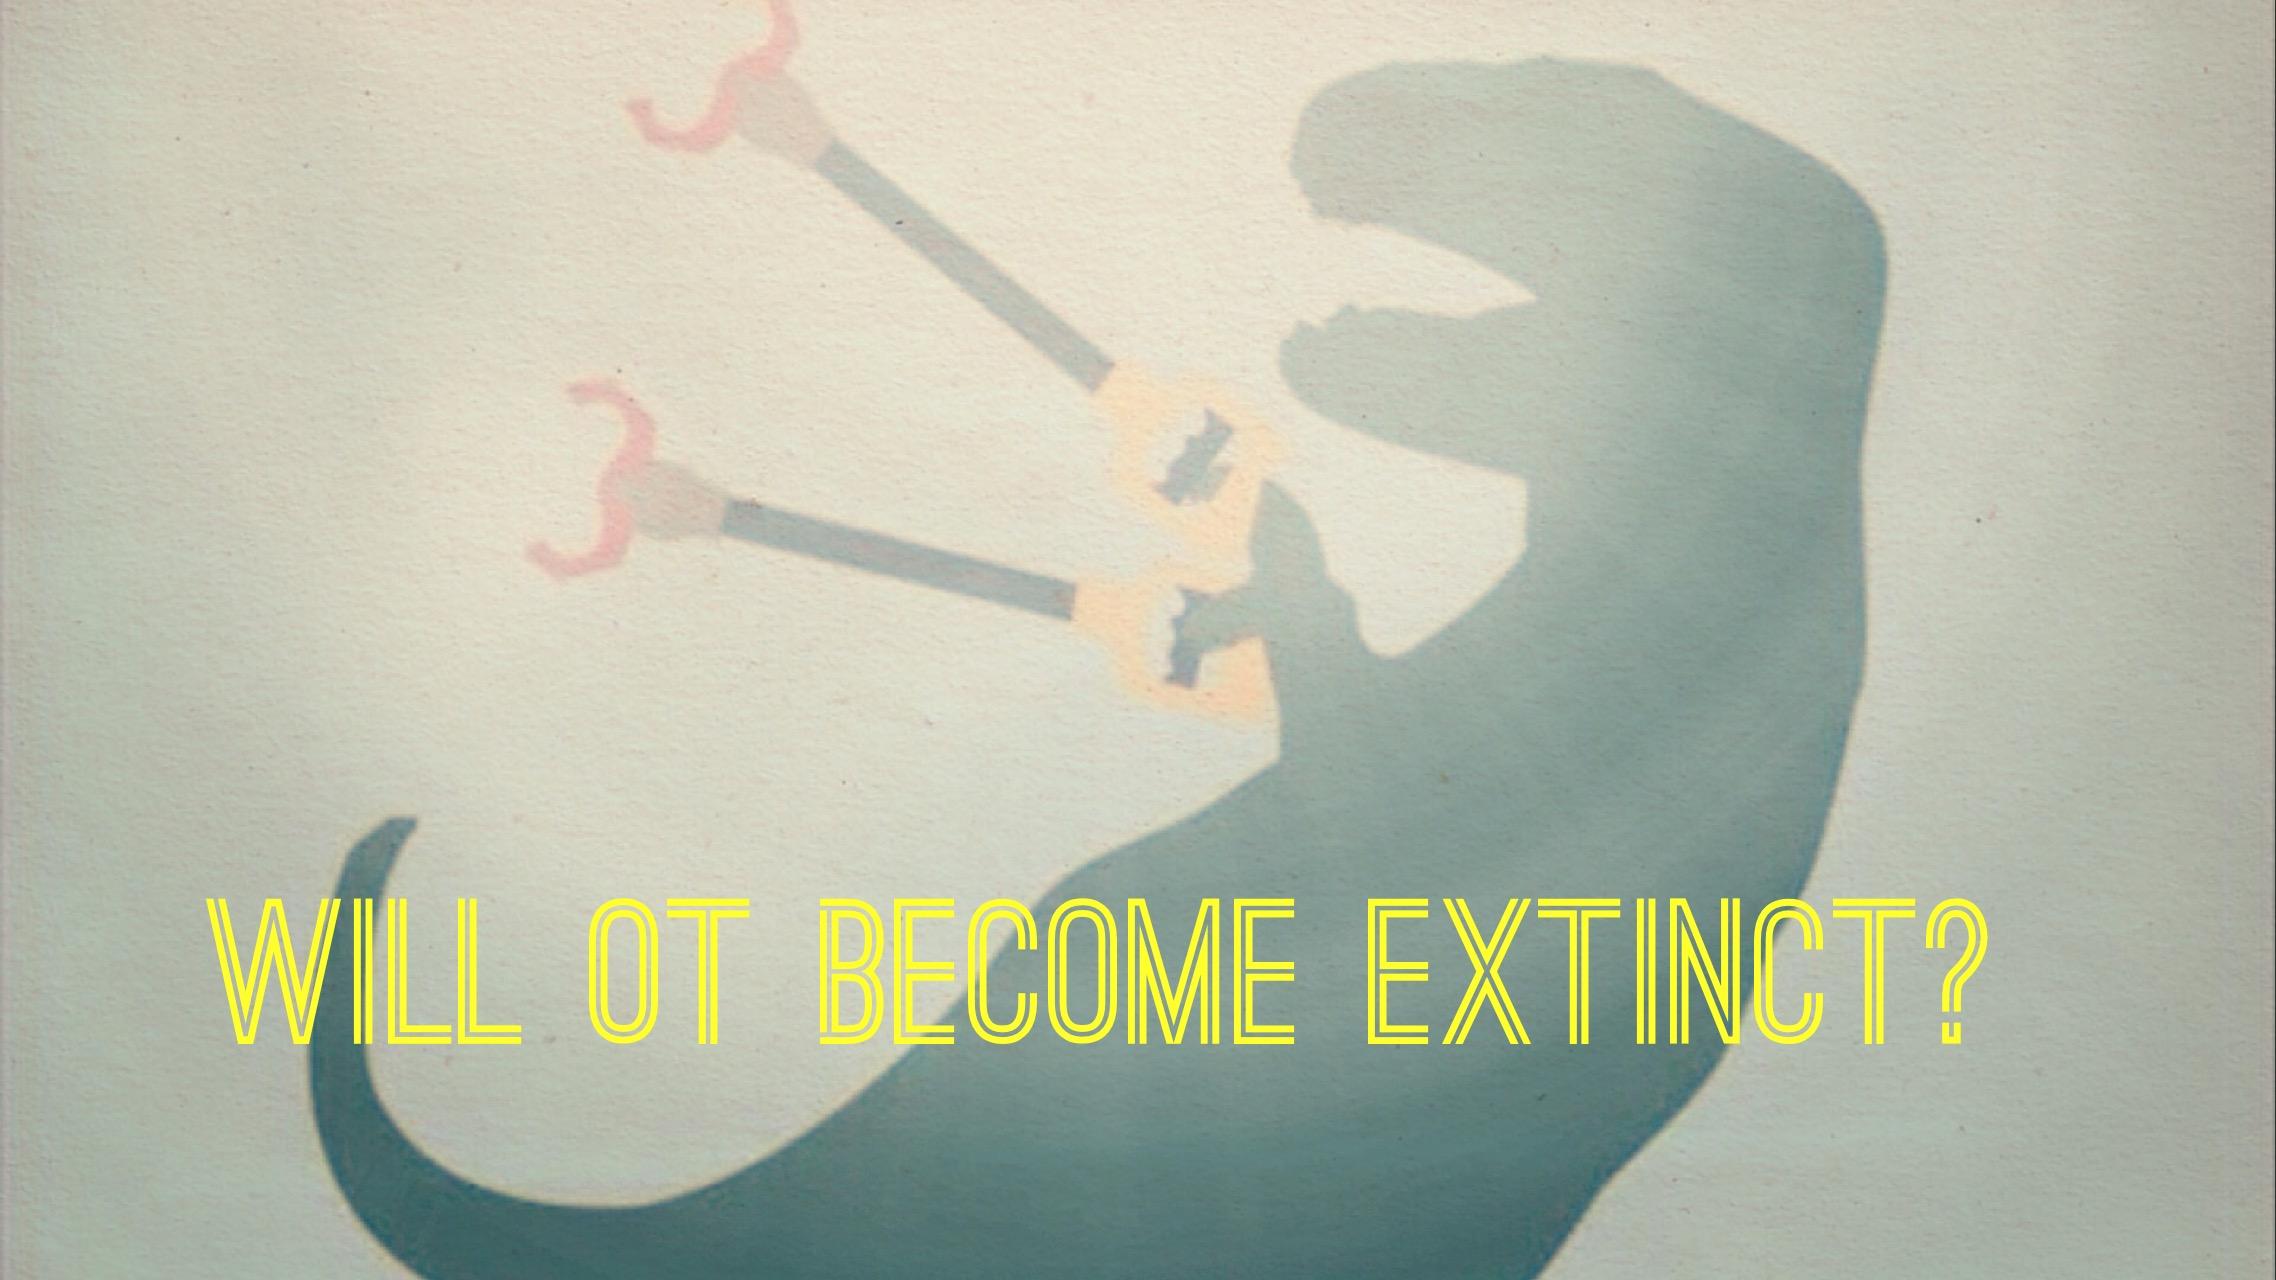 Will OT become extinct